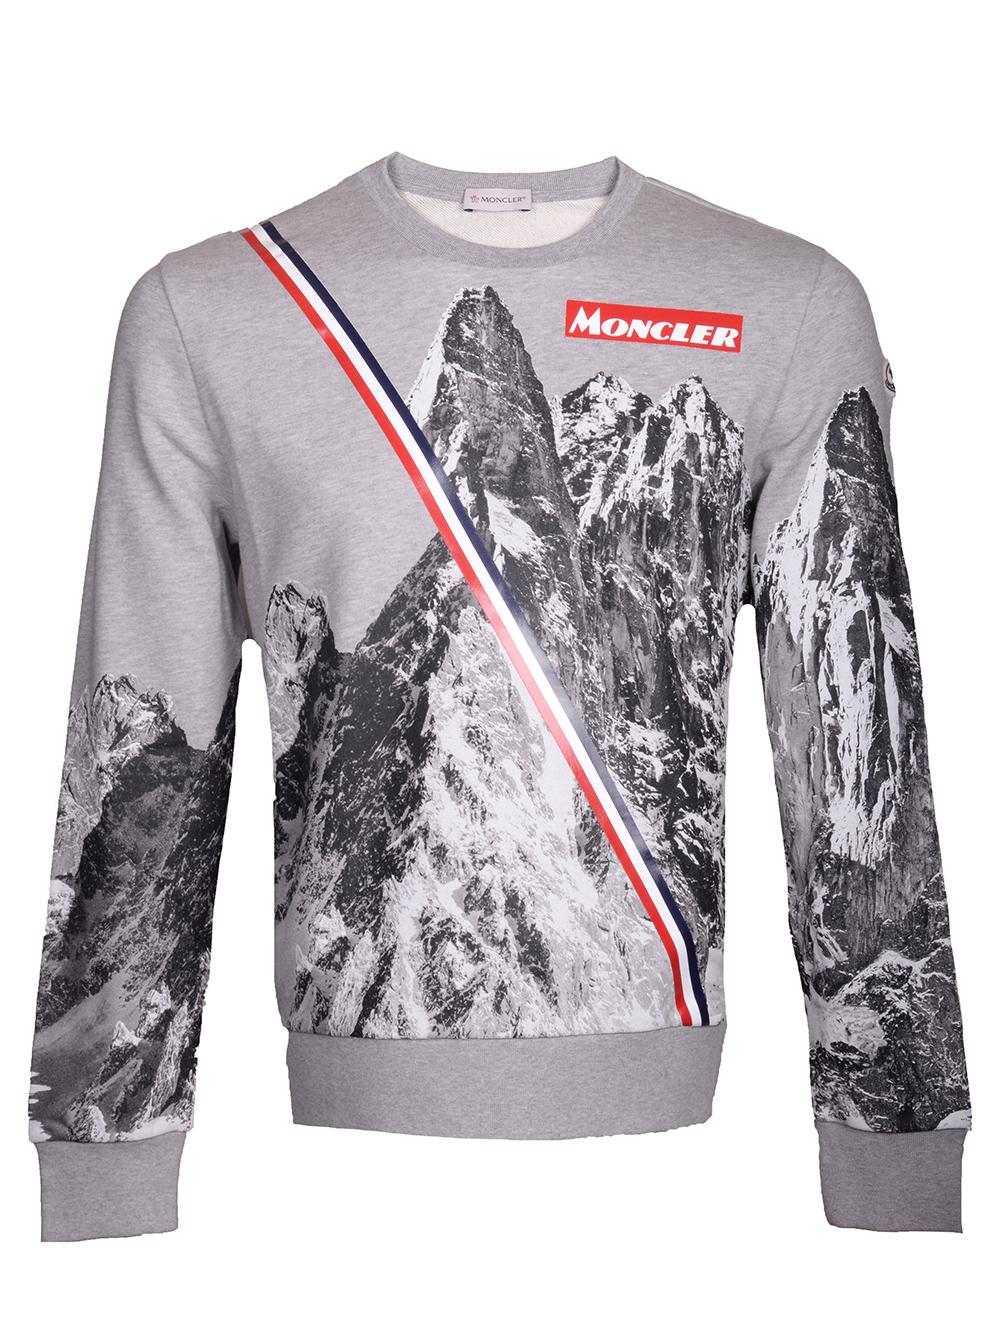 MONCLER Μπλούζα Τ-shirt E2-091-80479508 098U ΓΚΡΙ